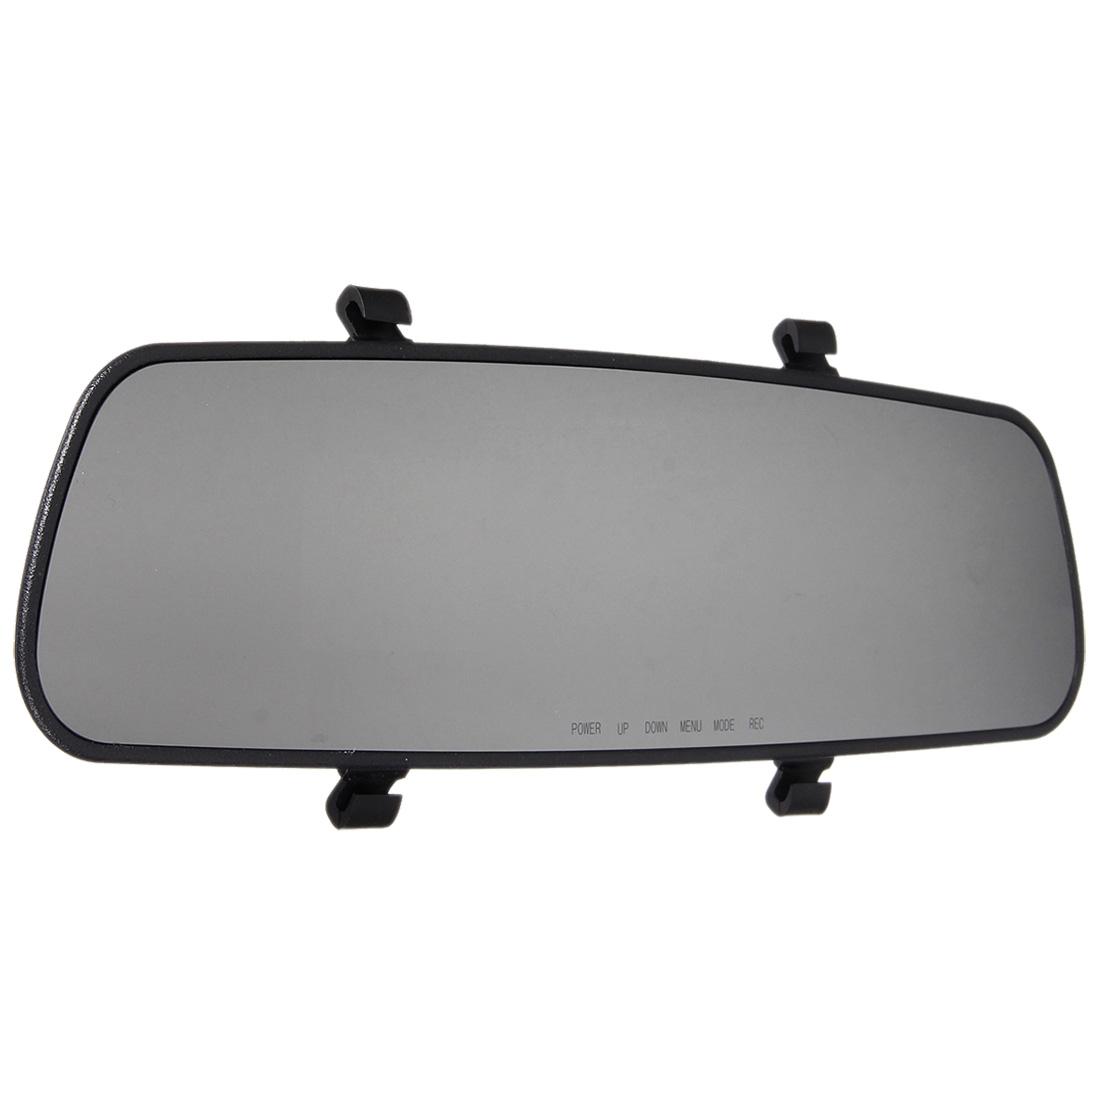 hd schlag nocken videogeraet spiegel auto kamera traeger. Black Bedroom Furniture Sets. Home Design Ideas